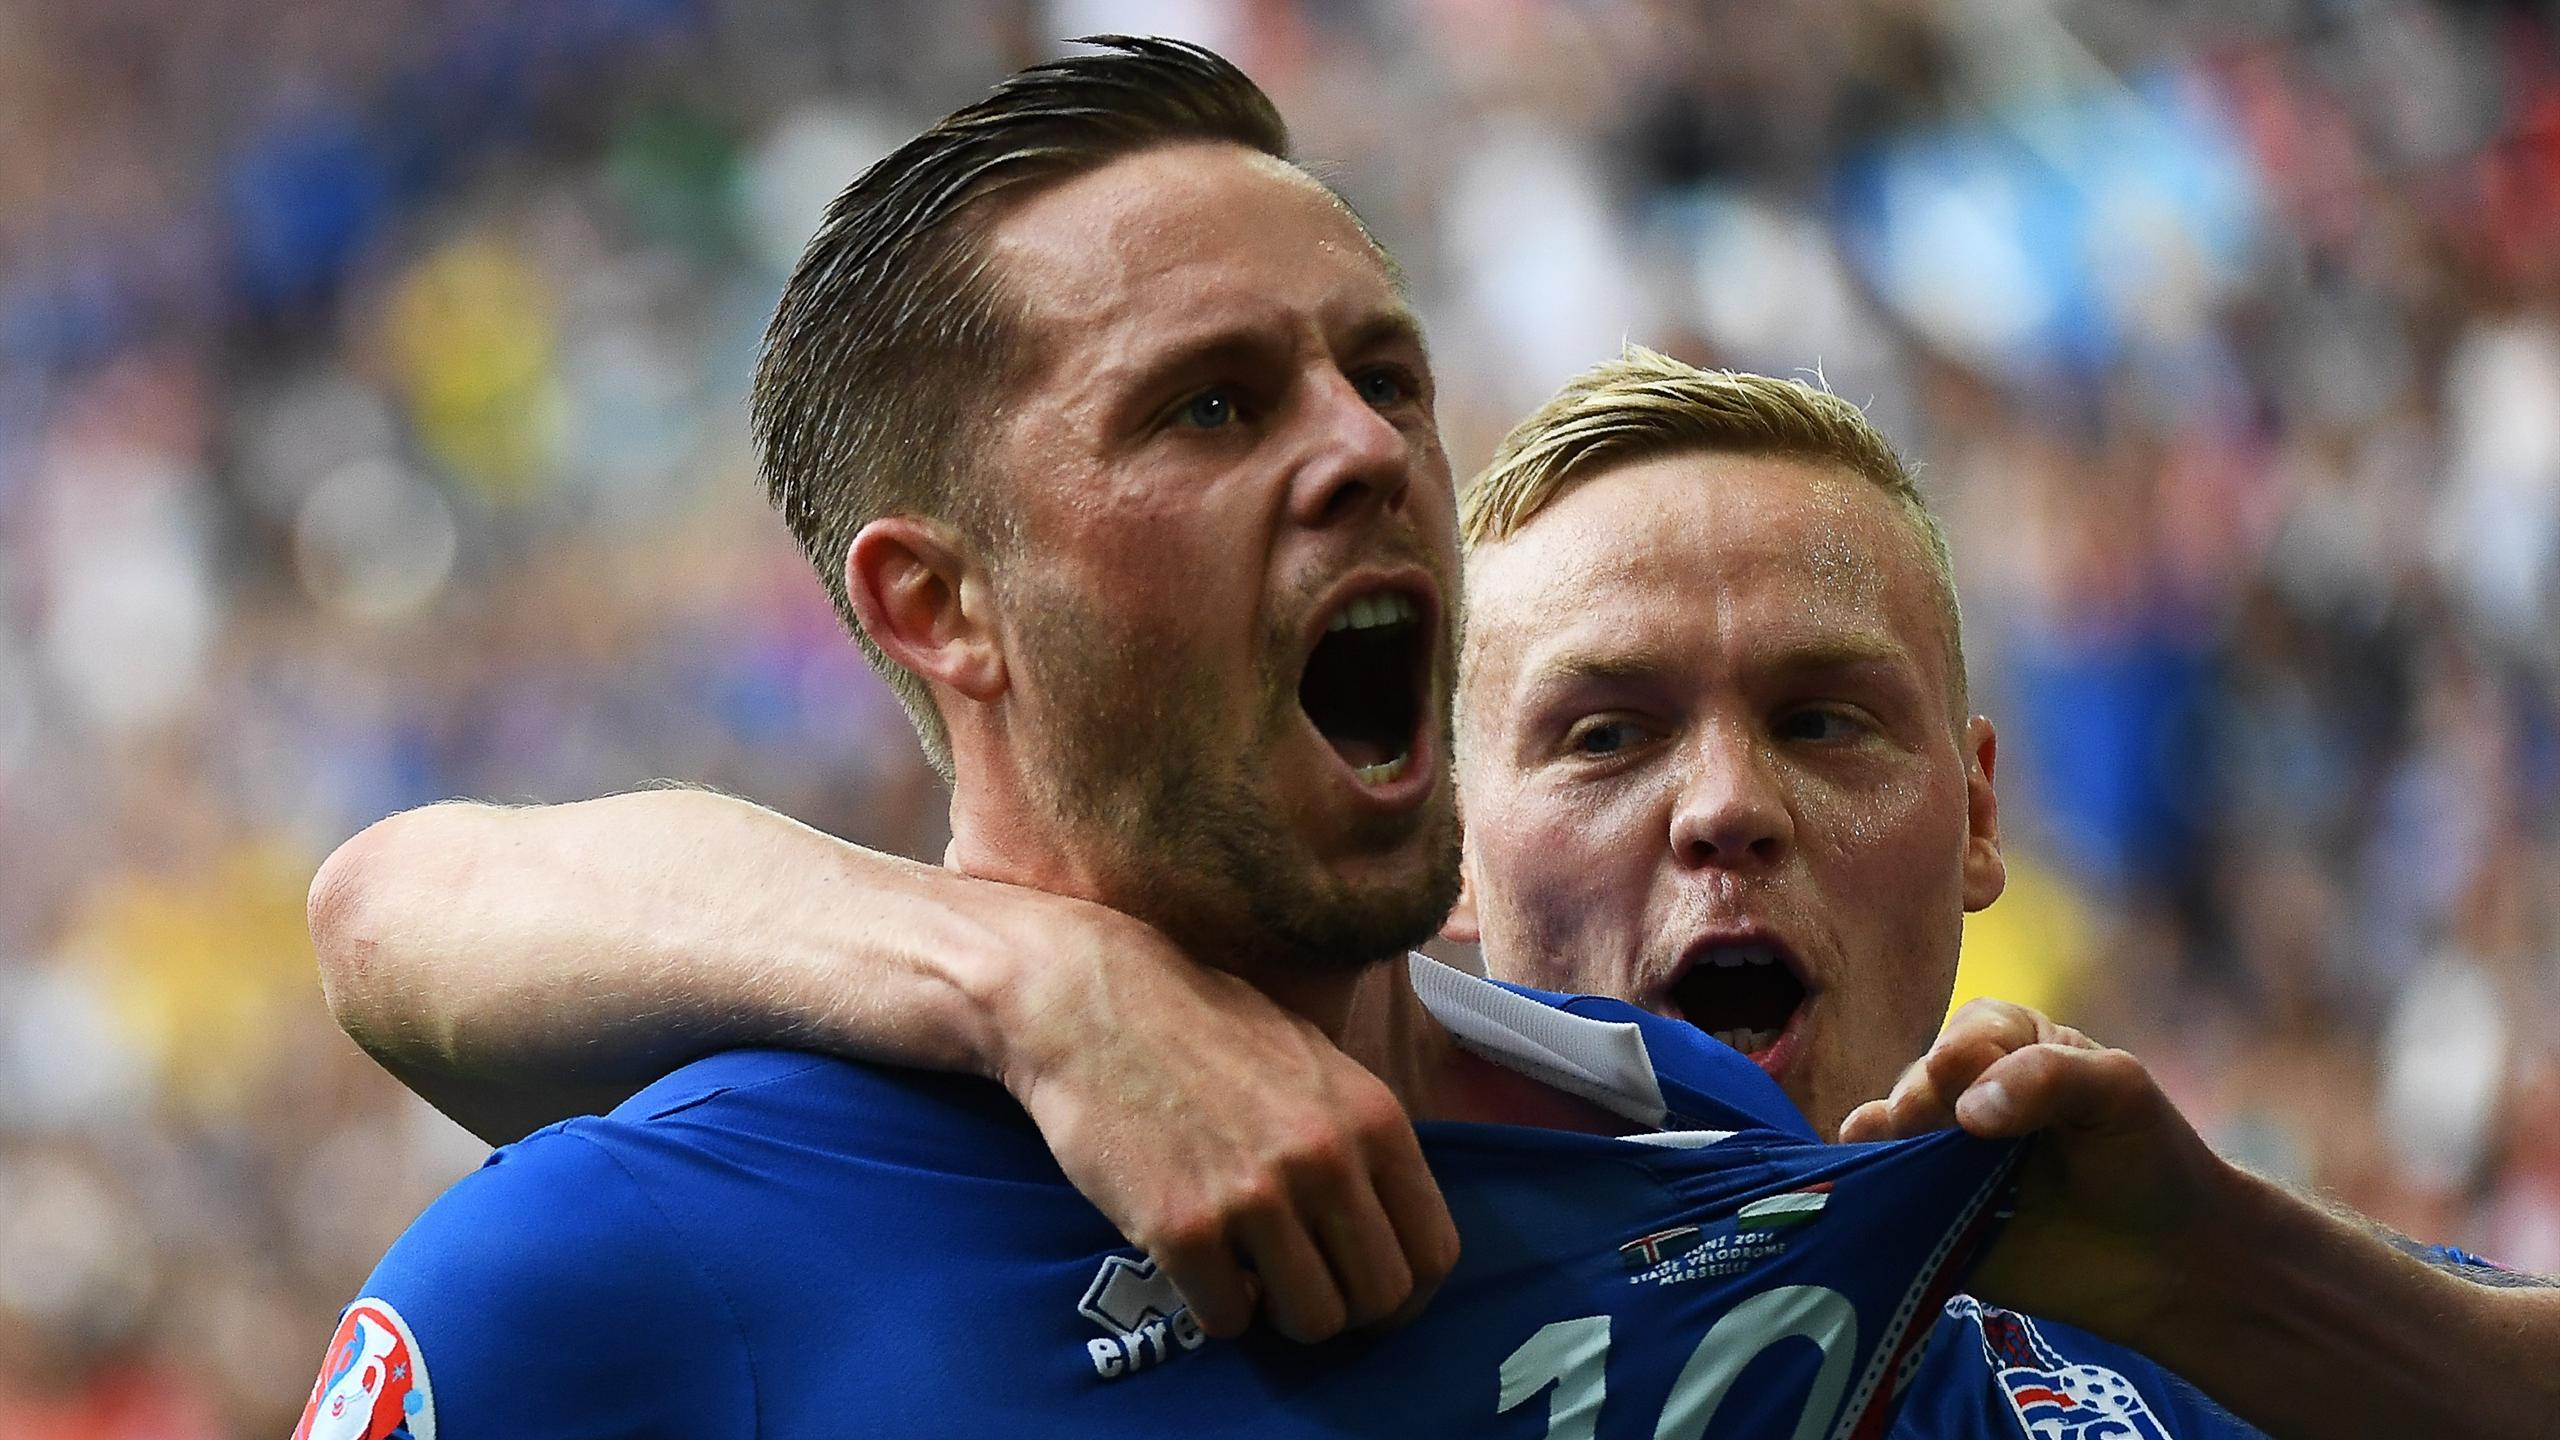 Iceland's midfielder Gylfi Sigurdsson (L) celebrates after scoring his team's first goal